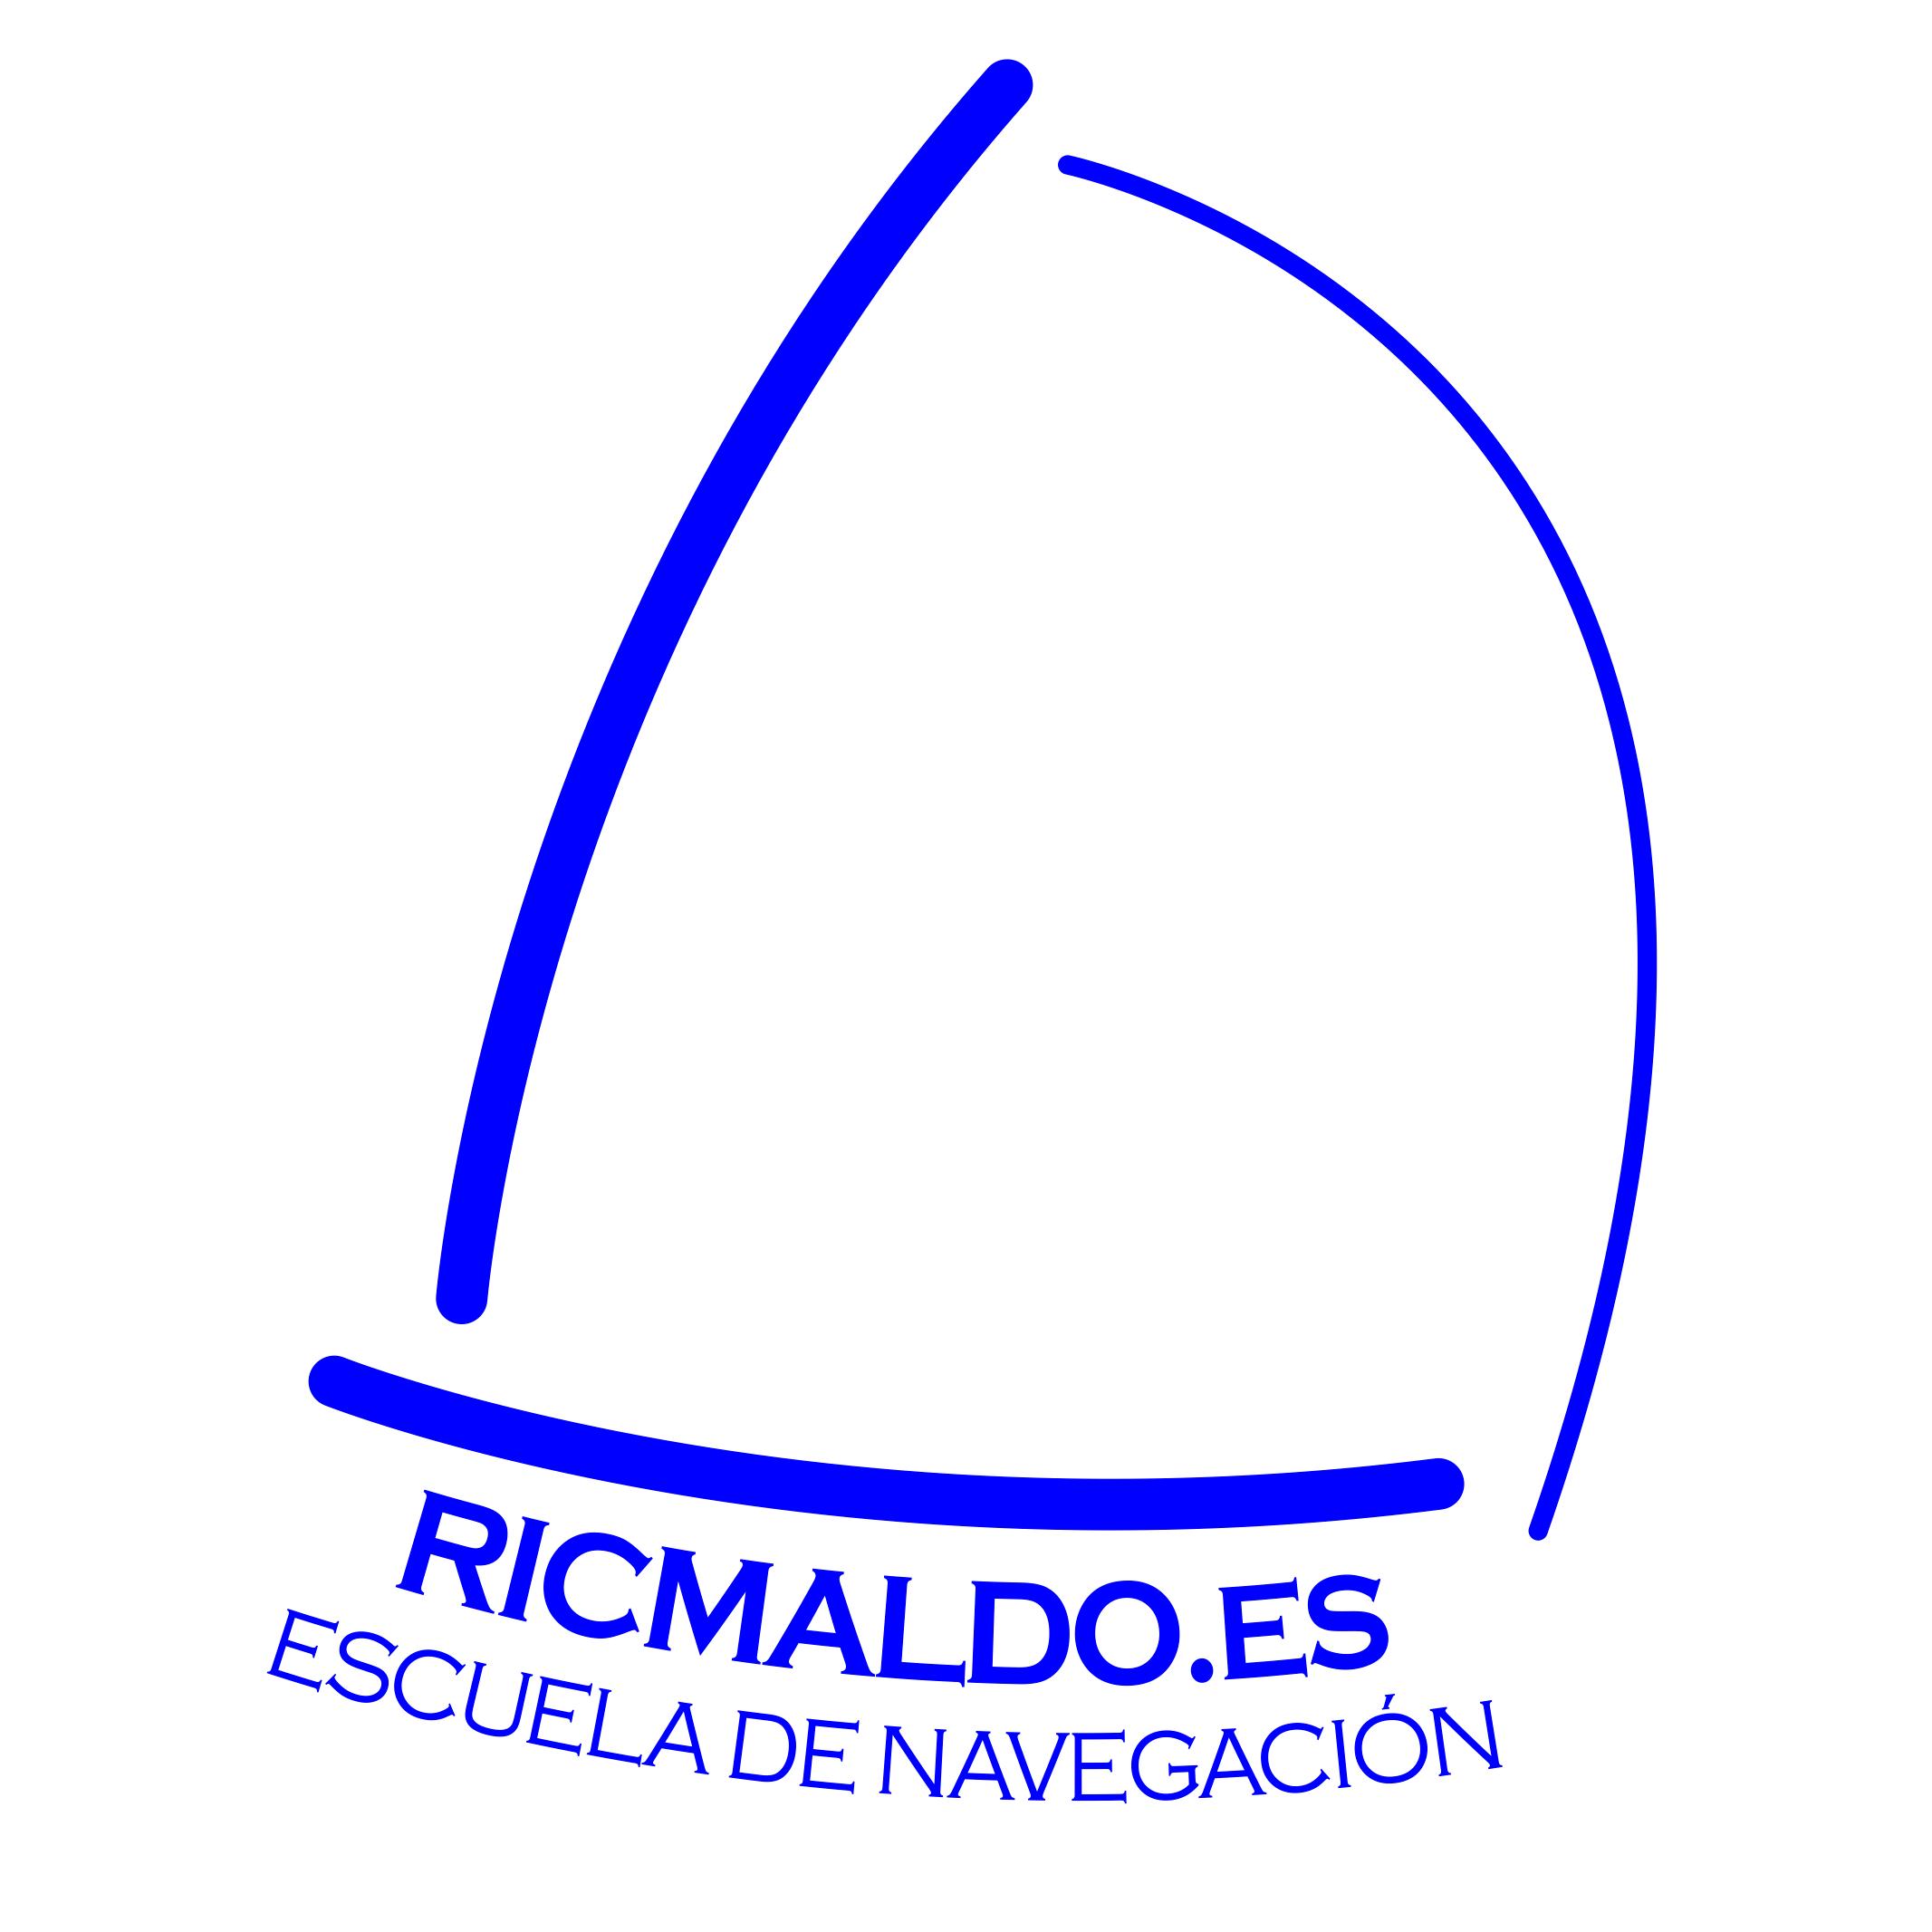 Logo Ricmaldo.es